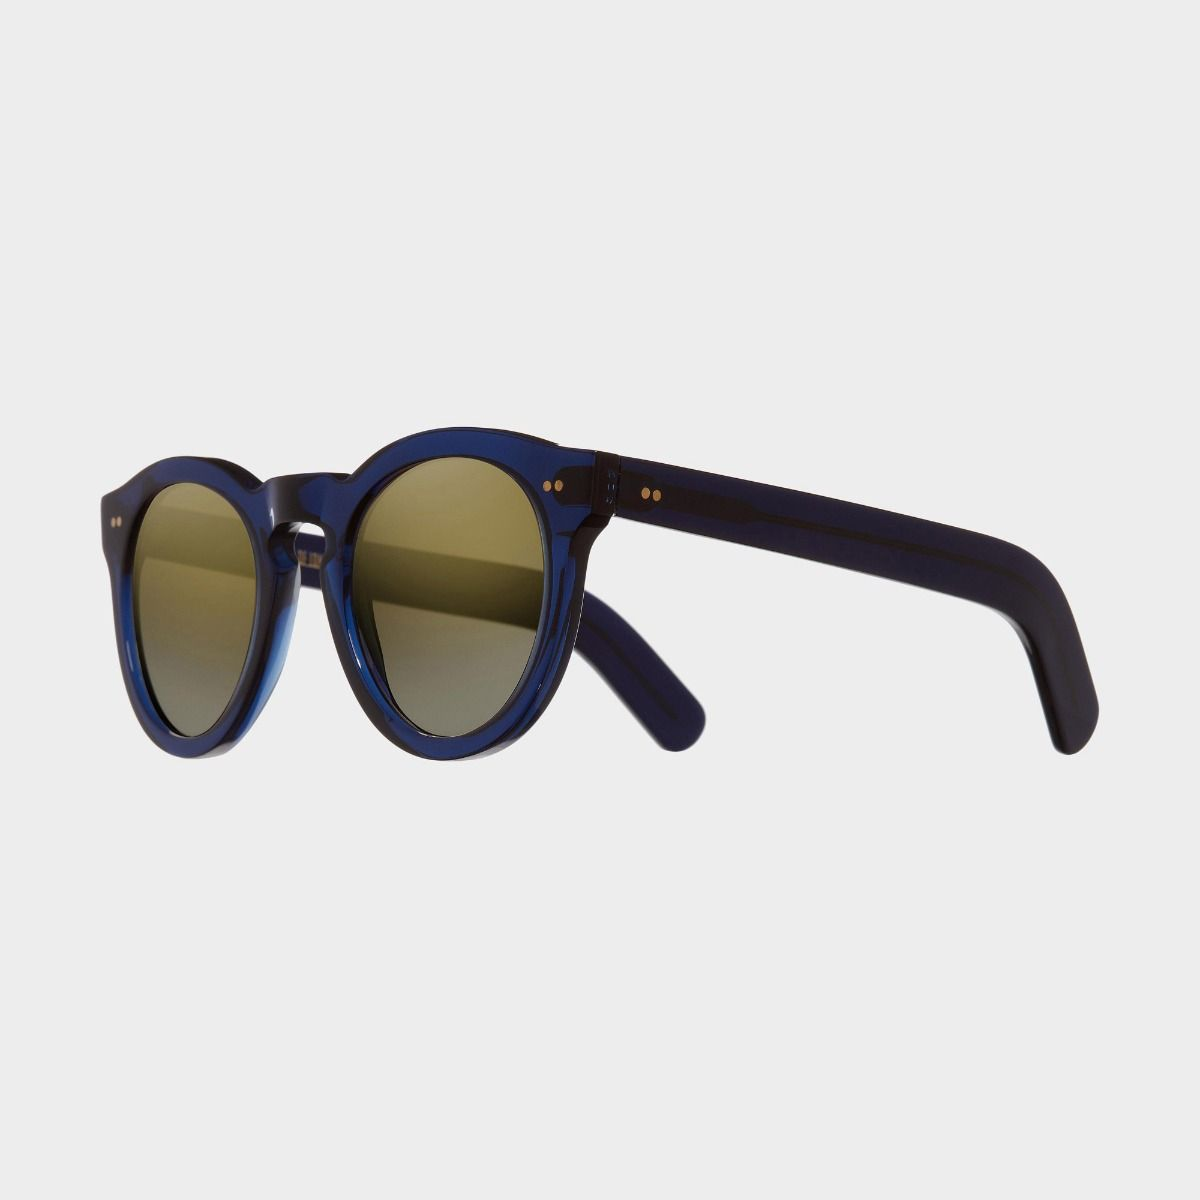 0734 Round Sunglasses (Large)-Classic Navy Blue